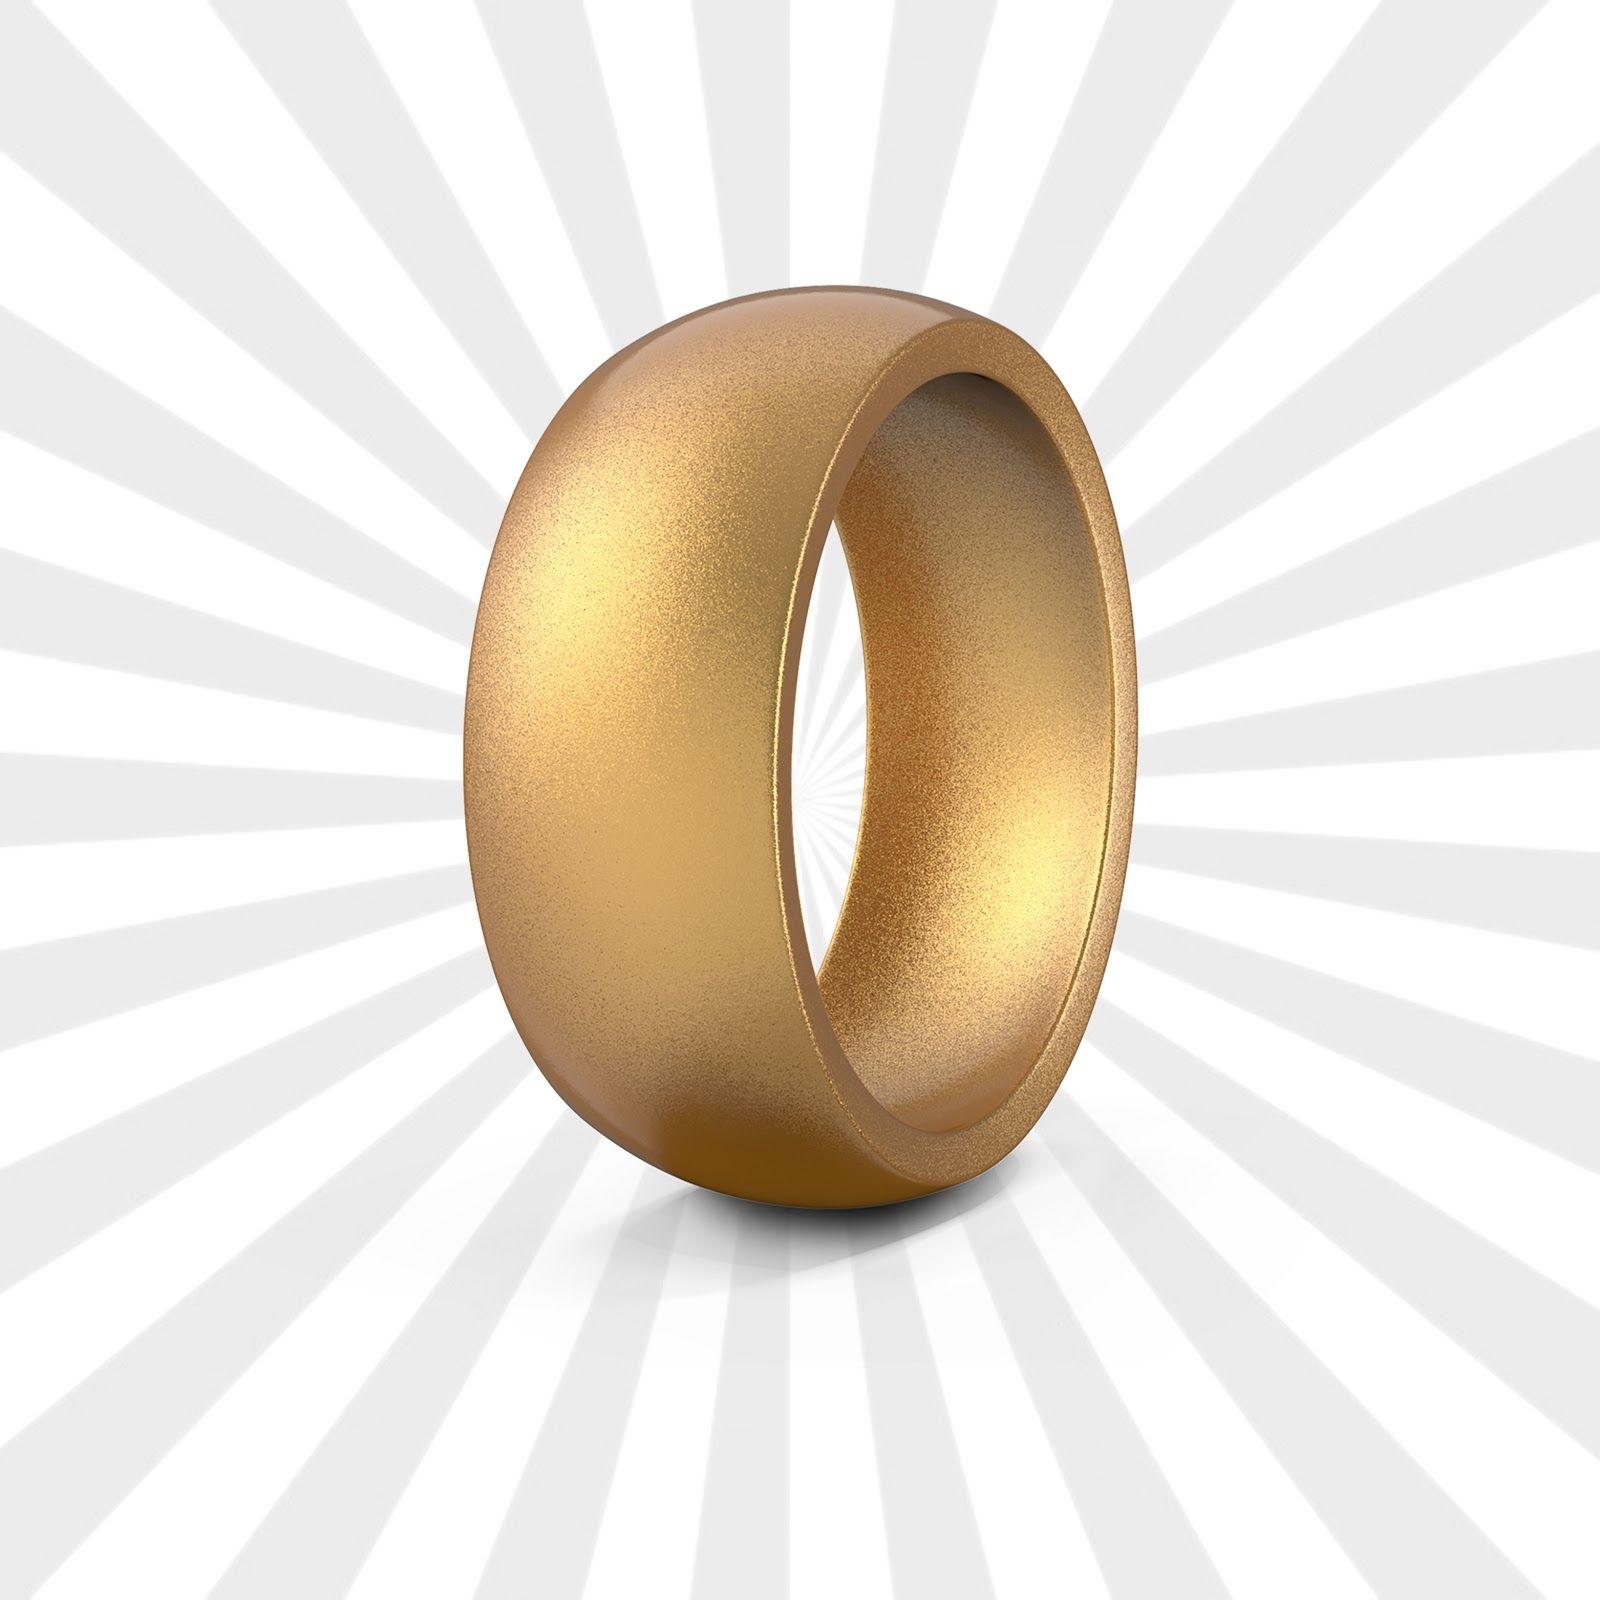 Wearing A Wedding Ring In A Dream in 2020 Wedding rings